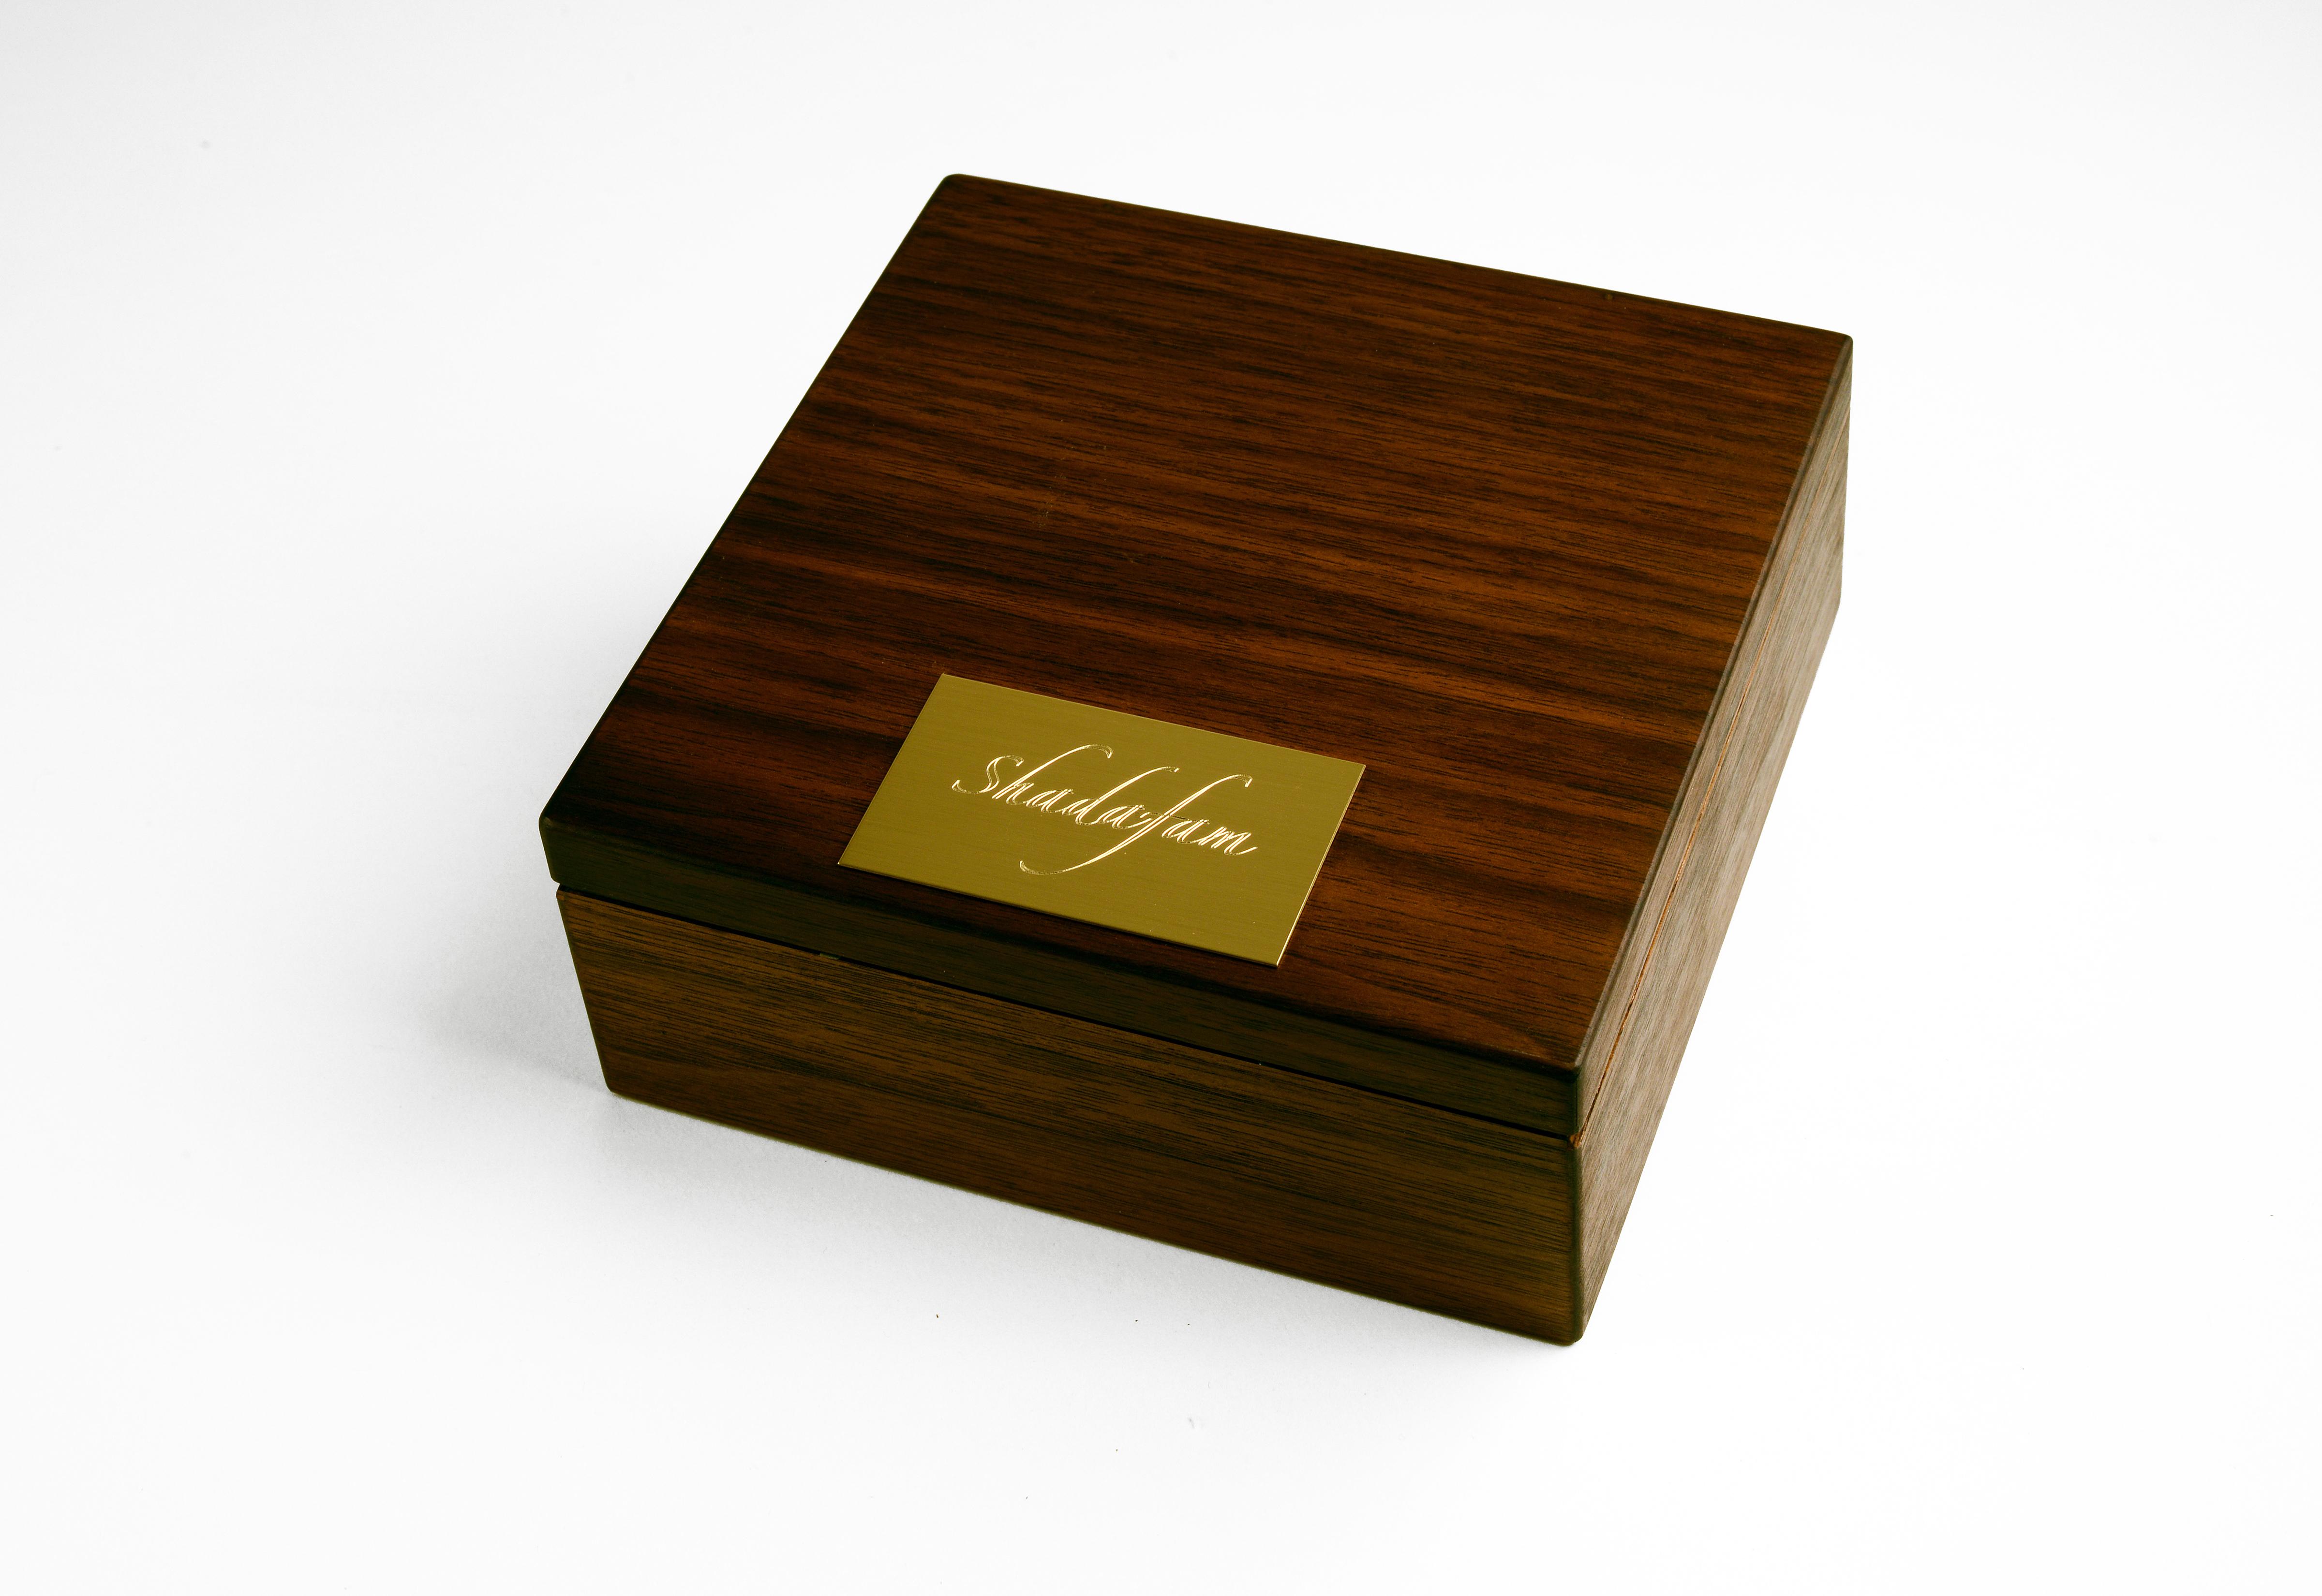 05-Mona-Shadowfam Small box- closed300-Final